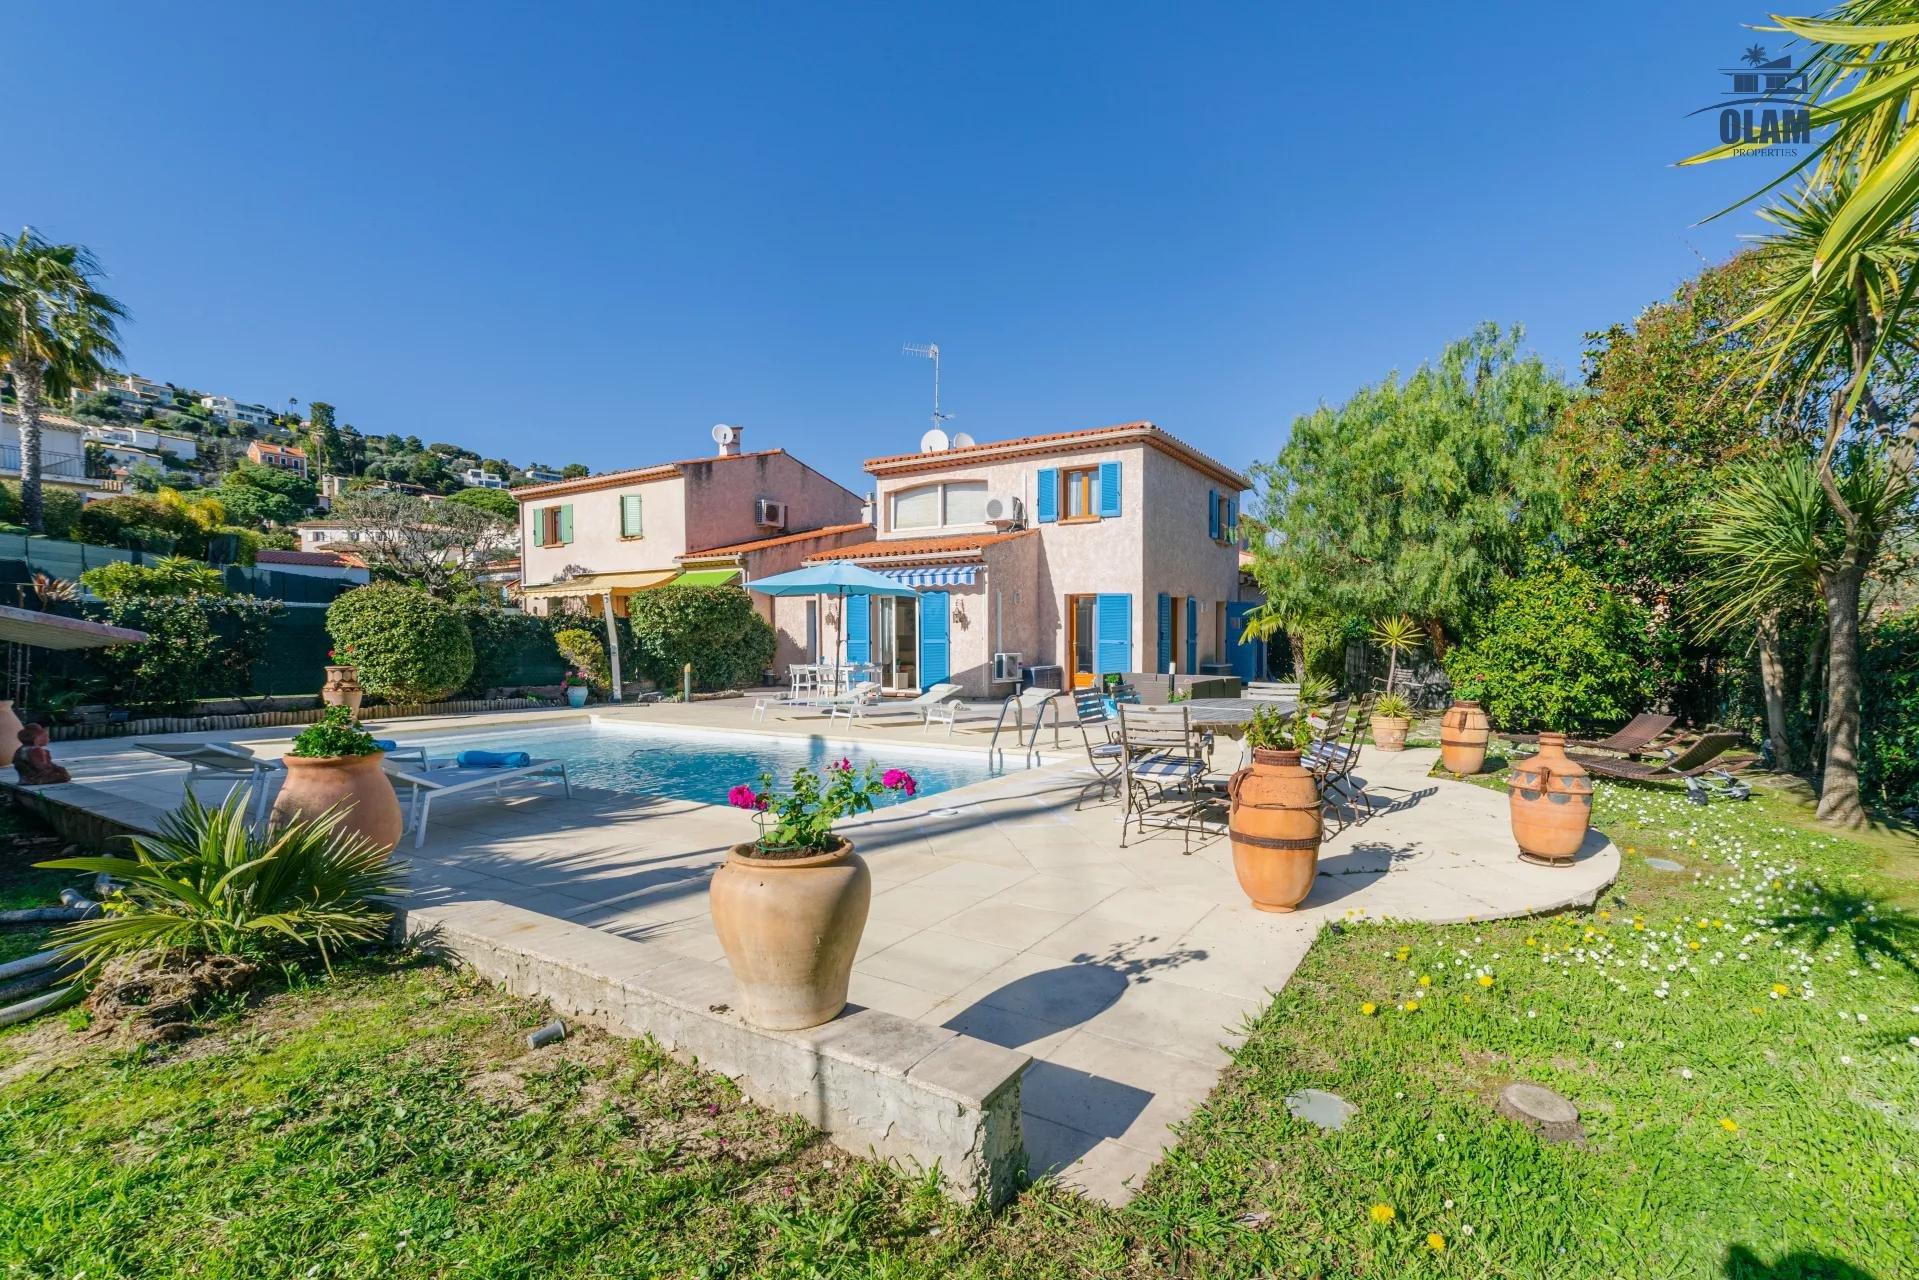 Maison familiale collines de Cannes - Jardin terrasse - Grande Piscine